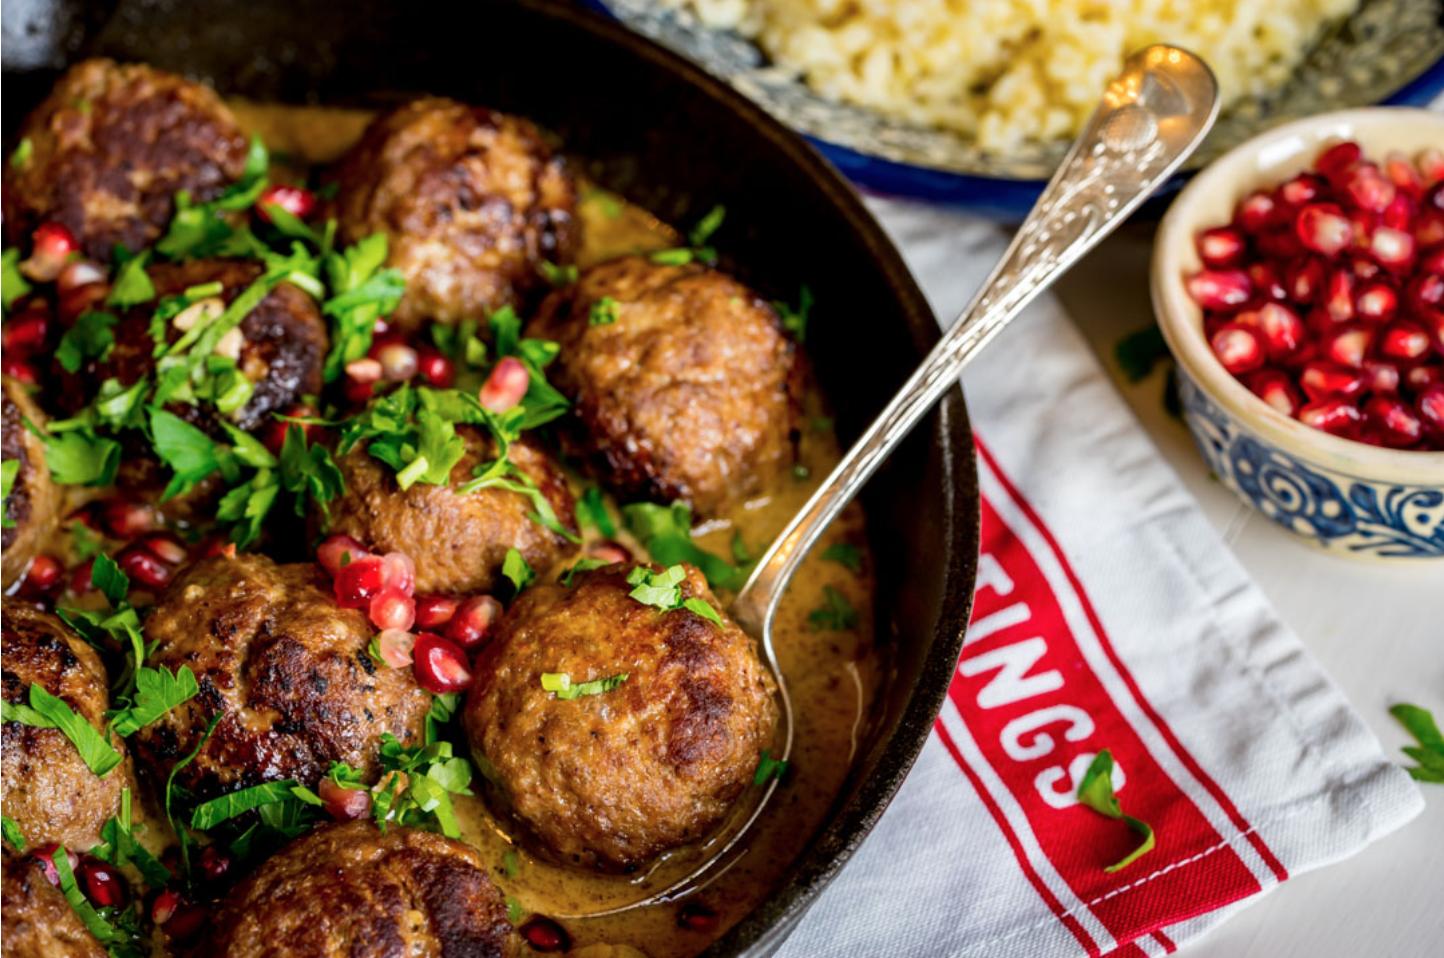 Meatballs in pomegranate sauce